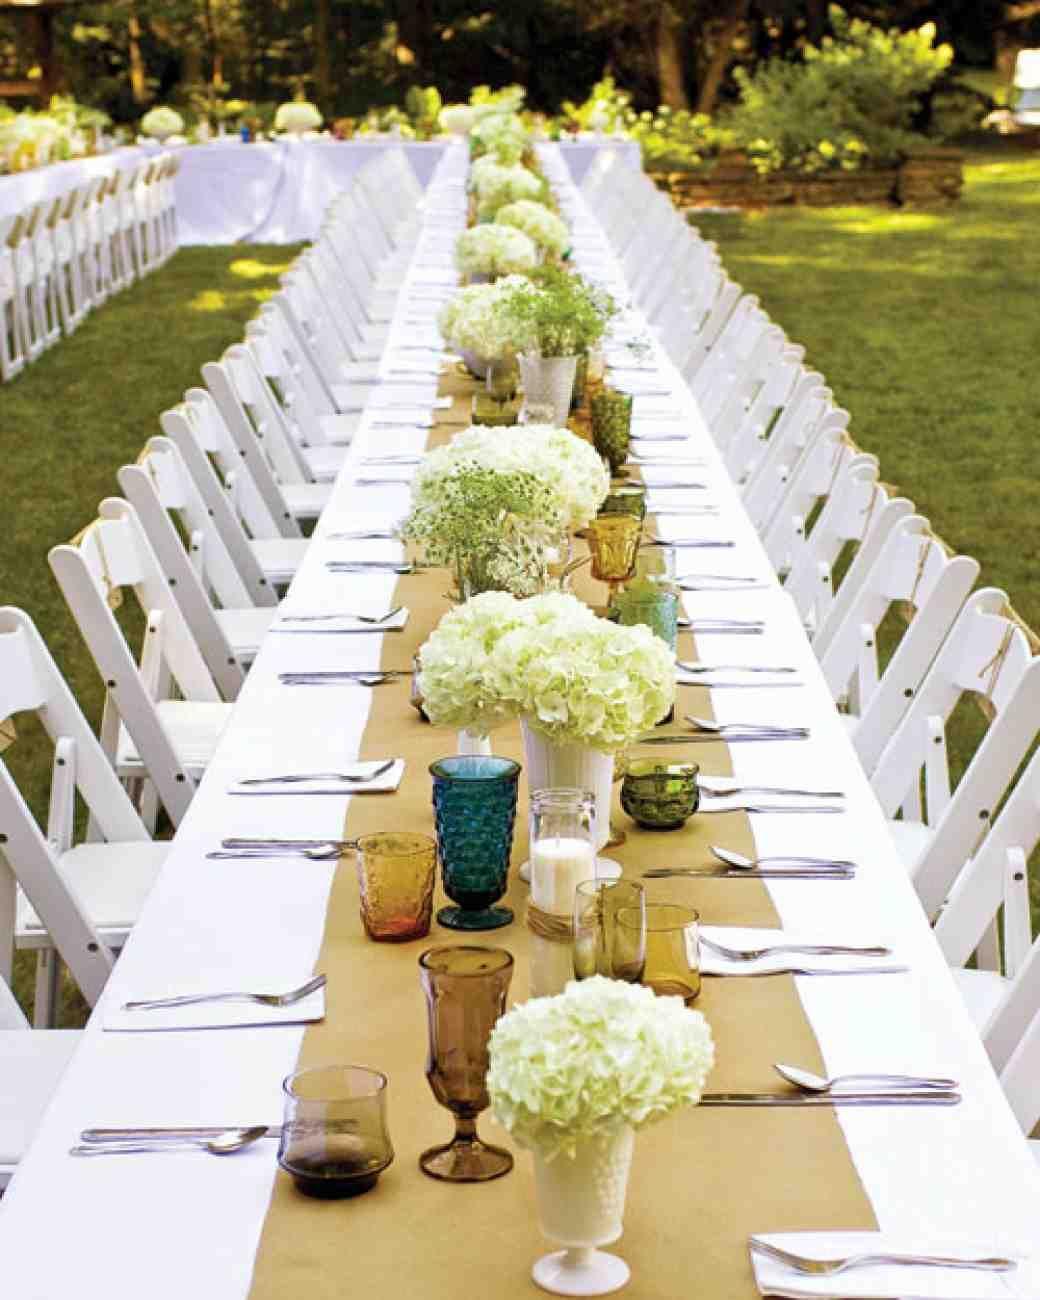 Martha Stewart Weddings Wedding Table Layouts Wedding Vases Wedding